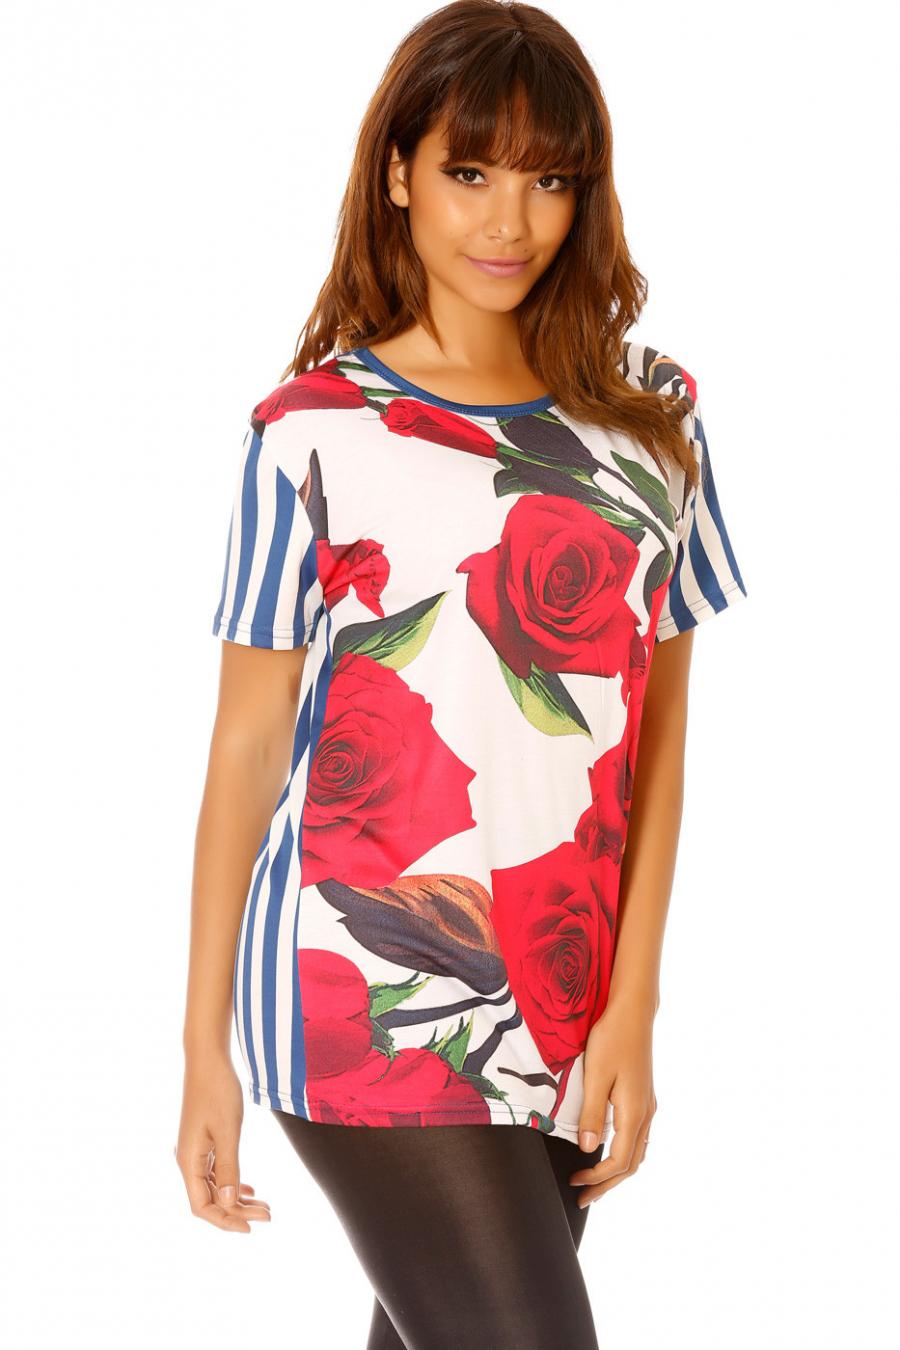 Tee-shirt rayé bleu avec fleurs. MC1665